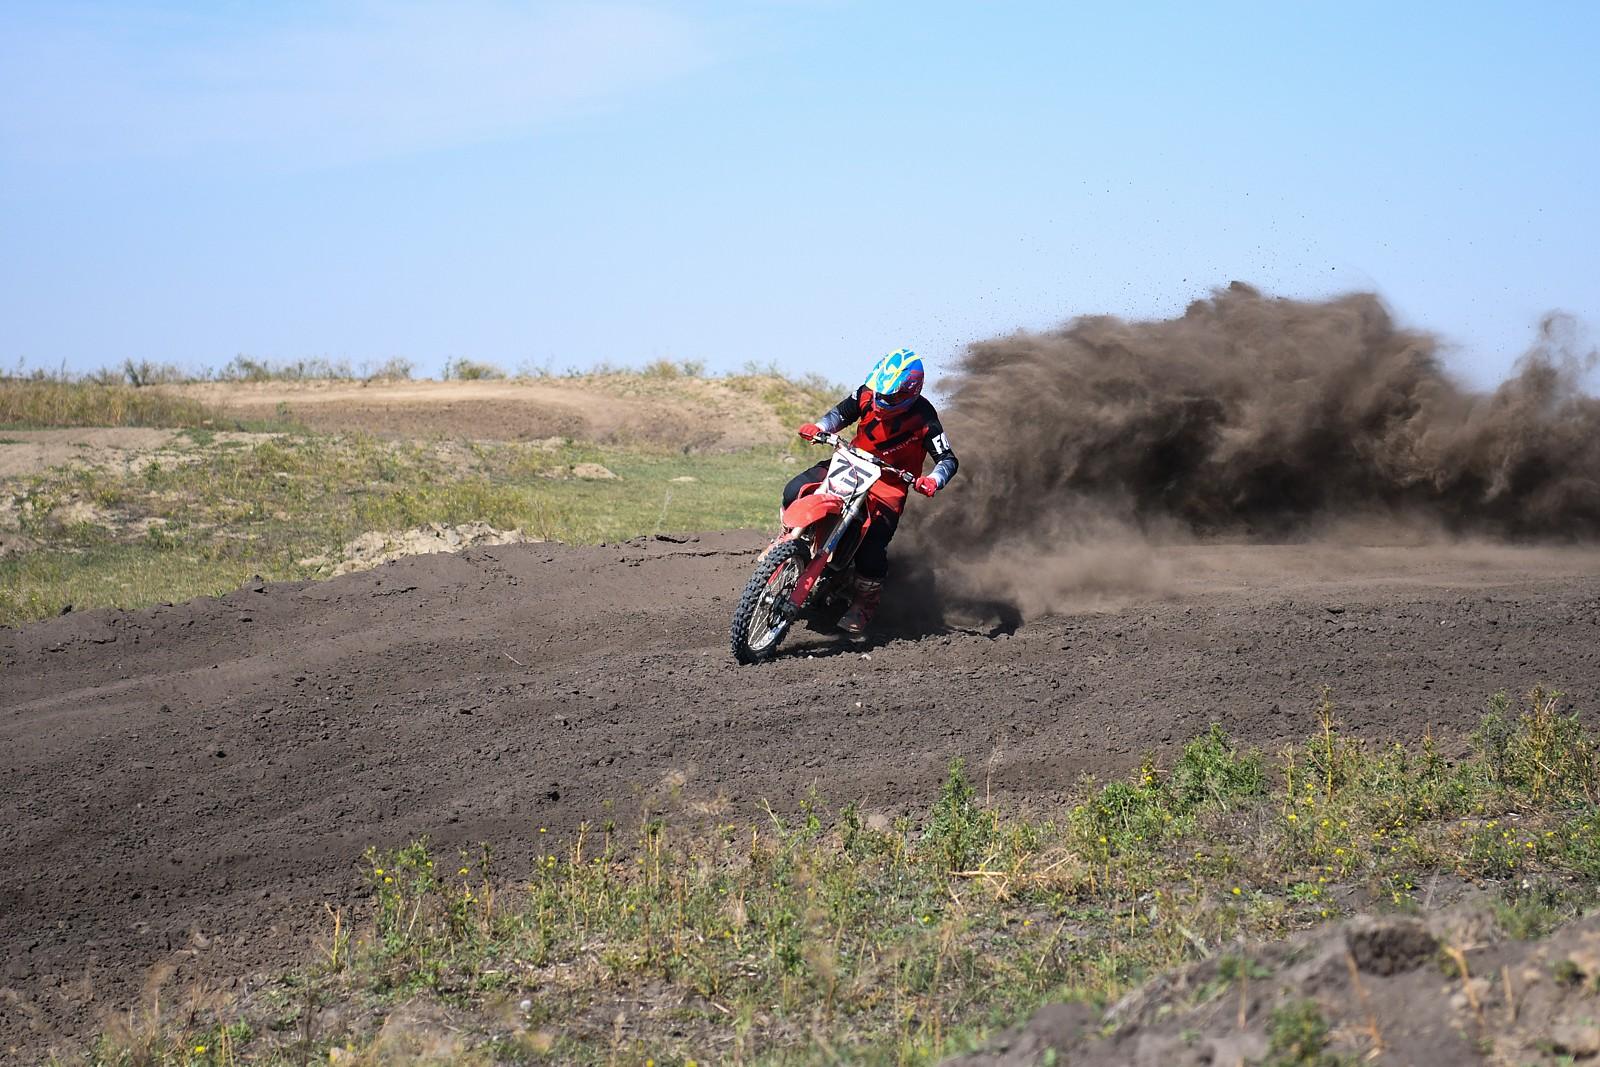 8530AC20-C24F-42C0-B53A-1A119BAB8B6D - whitechapel44 - Motocross Pictures - Vital MX